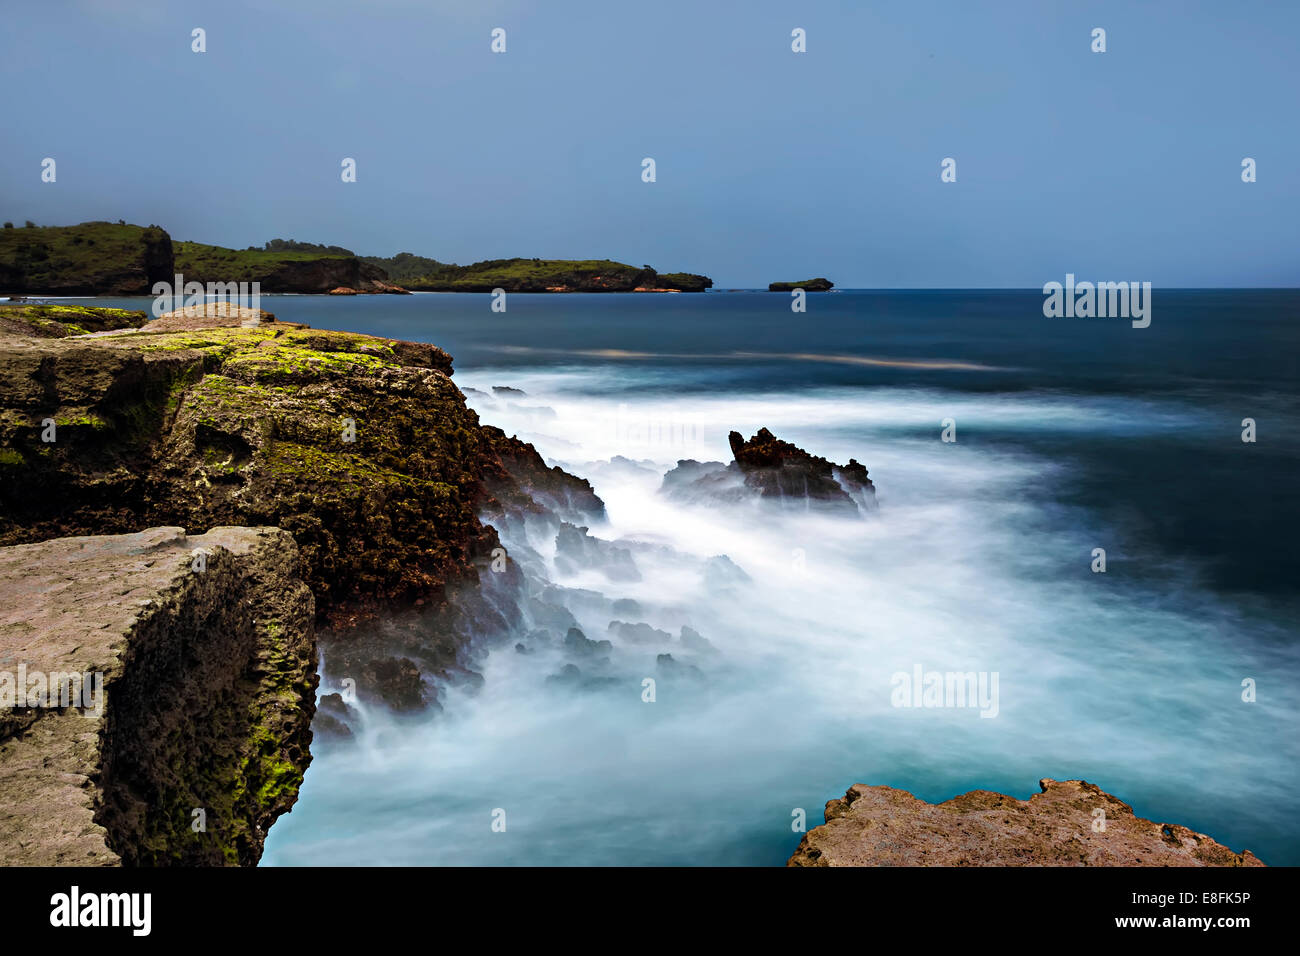 Klayar Beach, Pacitan, Indonesia, Southeast Asia Klayar Beach - Stock Image